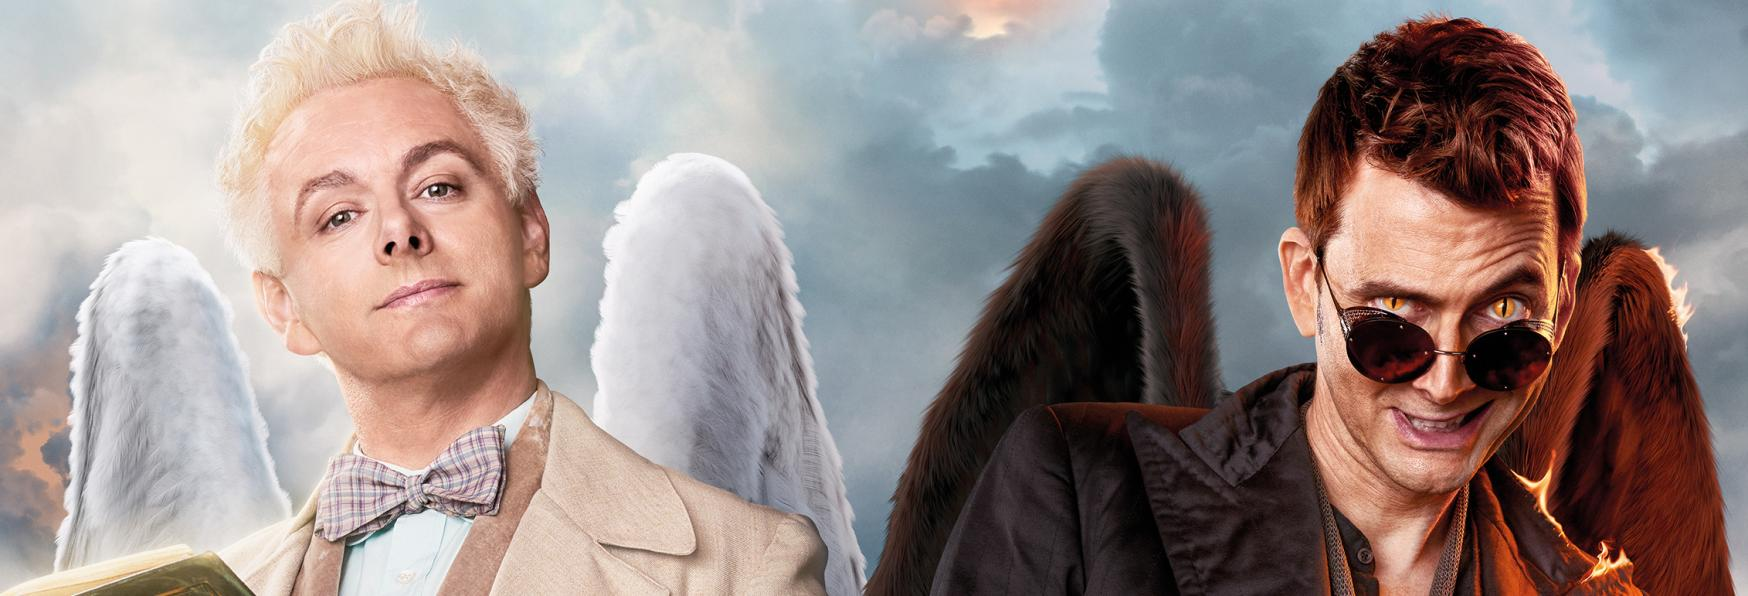 Good Omens: la serie TV con David Tennant e Michael Sheen Vince i Comedy Awards 2019